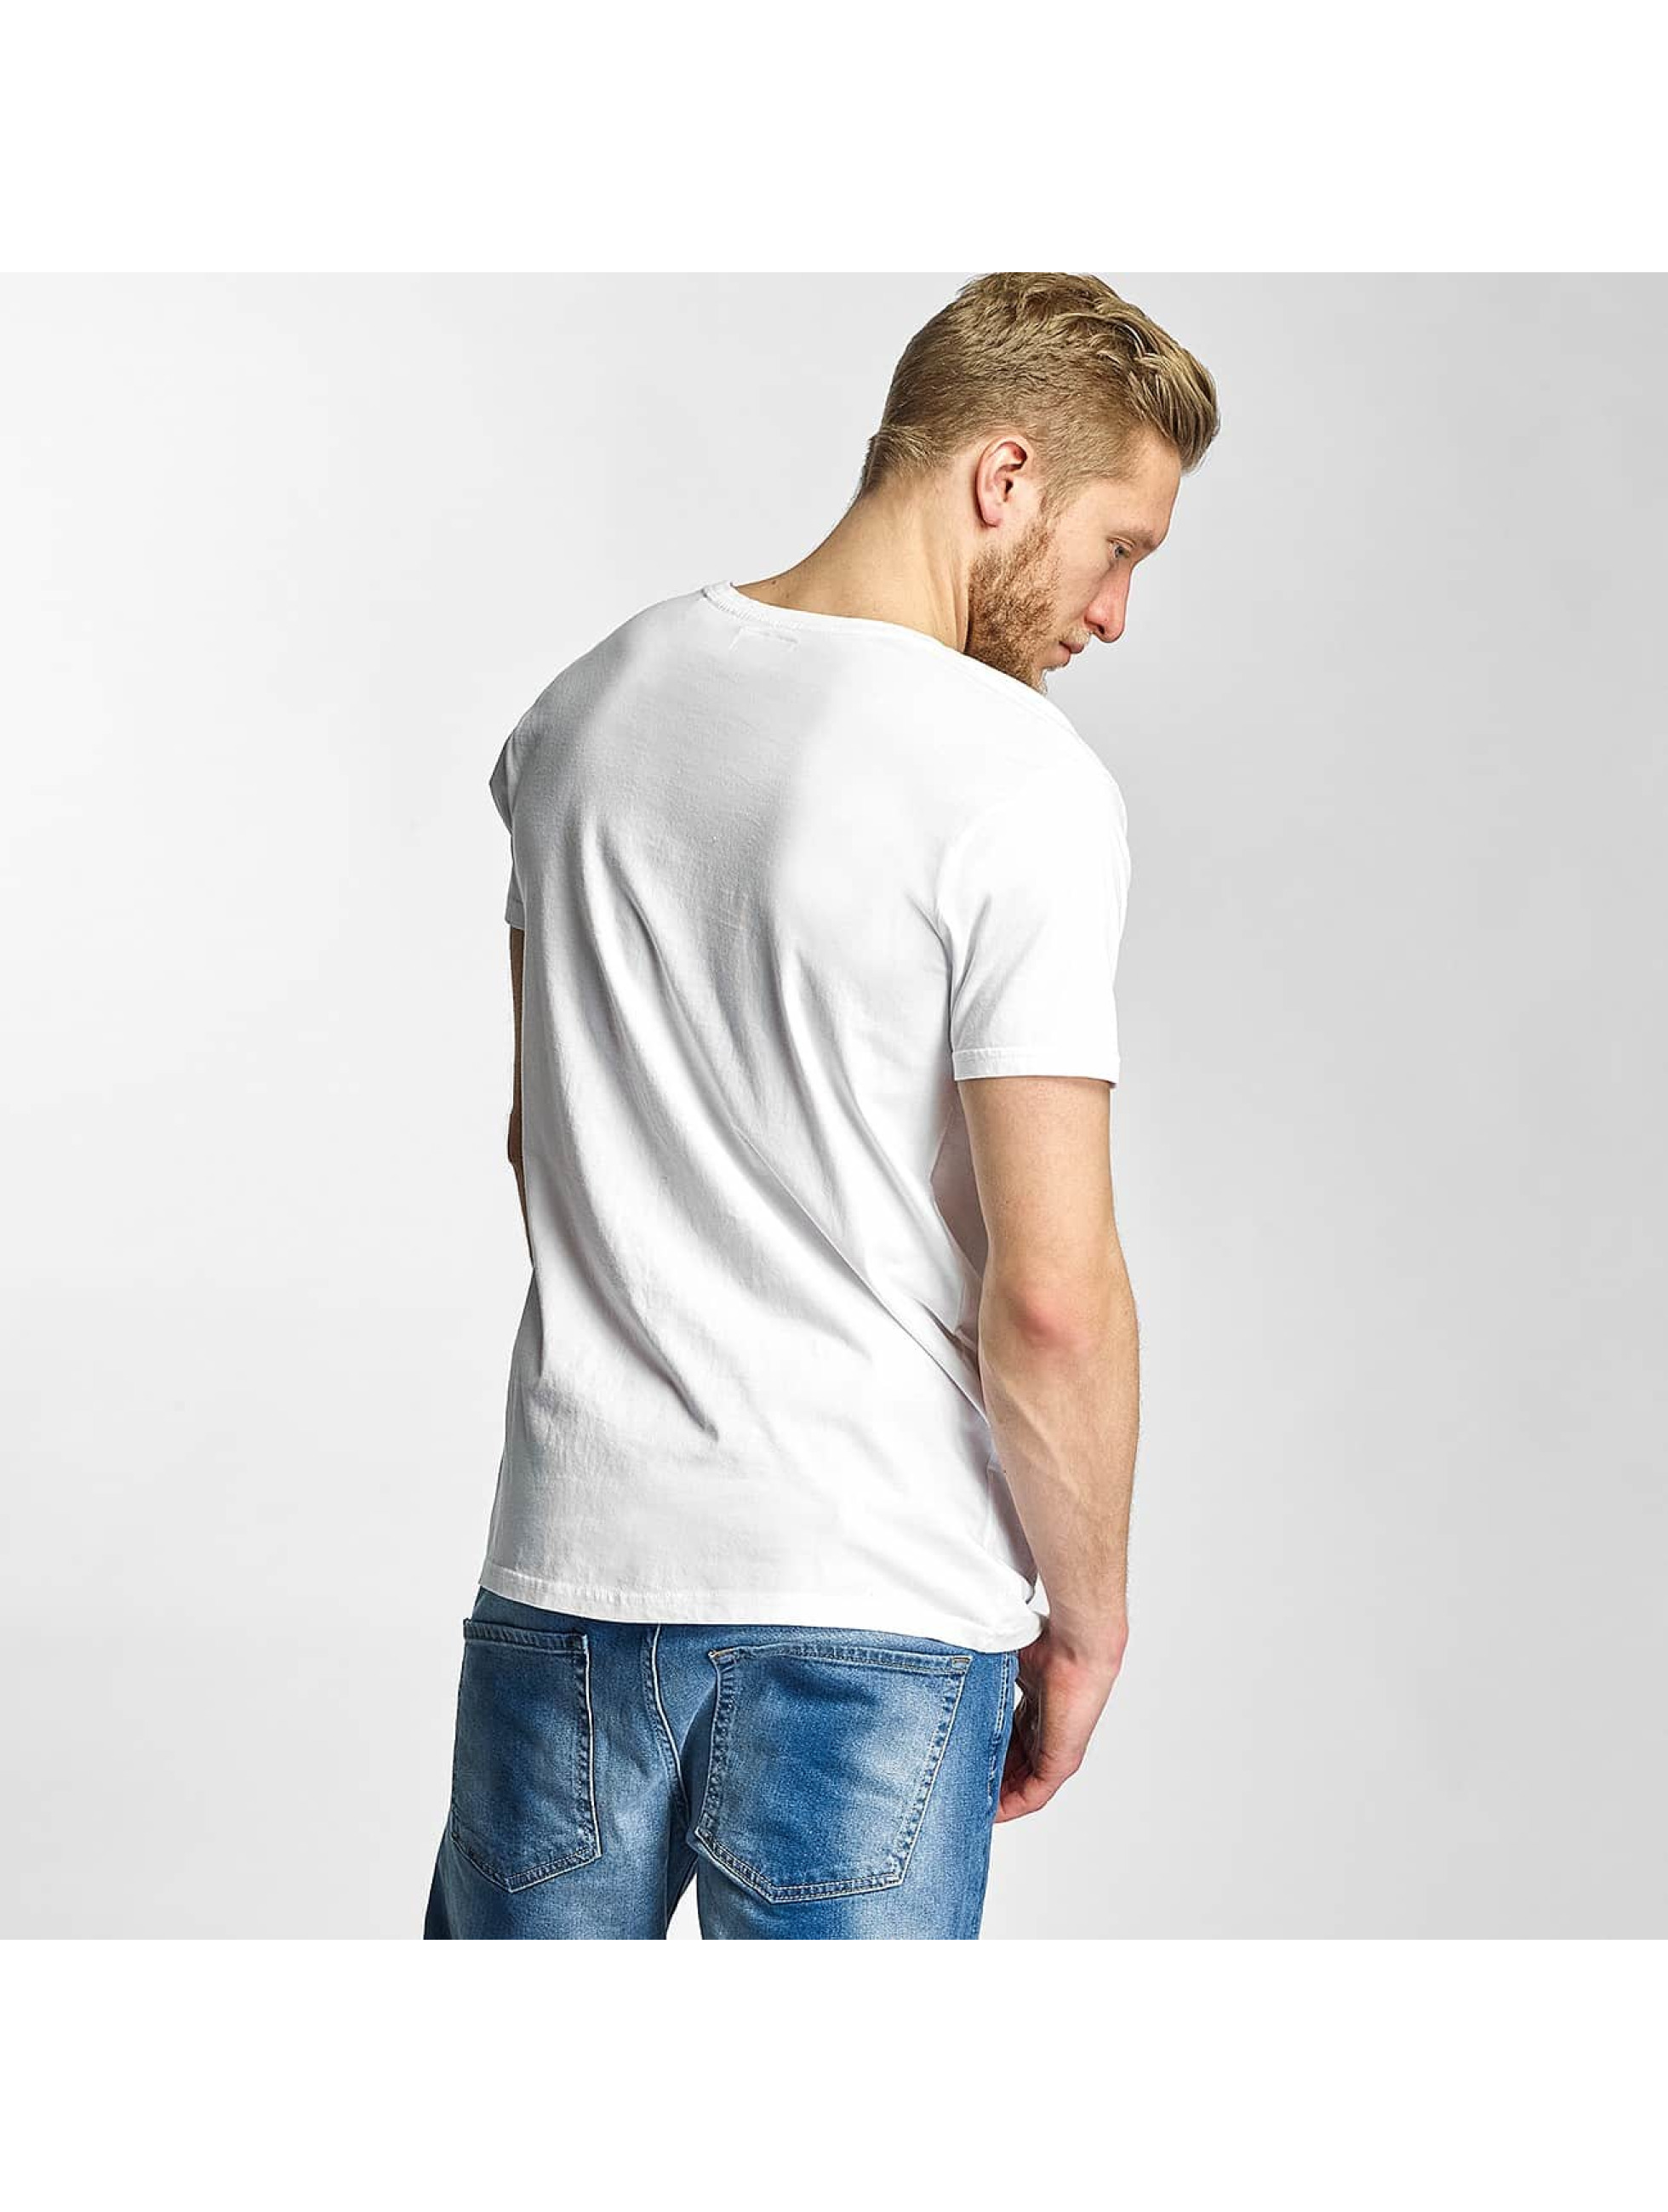 SHINE Original T-Shirt Parental Advisory white